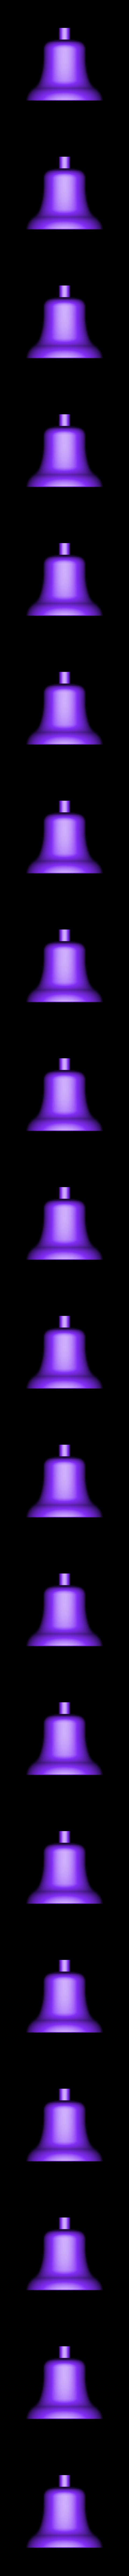 Bell.STL Download free STL file 4-8-8-4 Big Boy Locomotive • 3D printer object, RaymondDeLuca